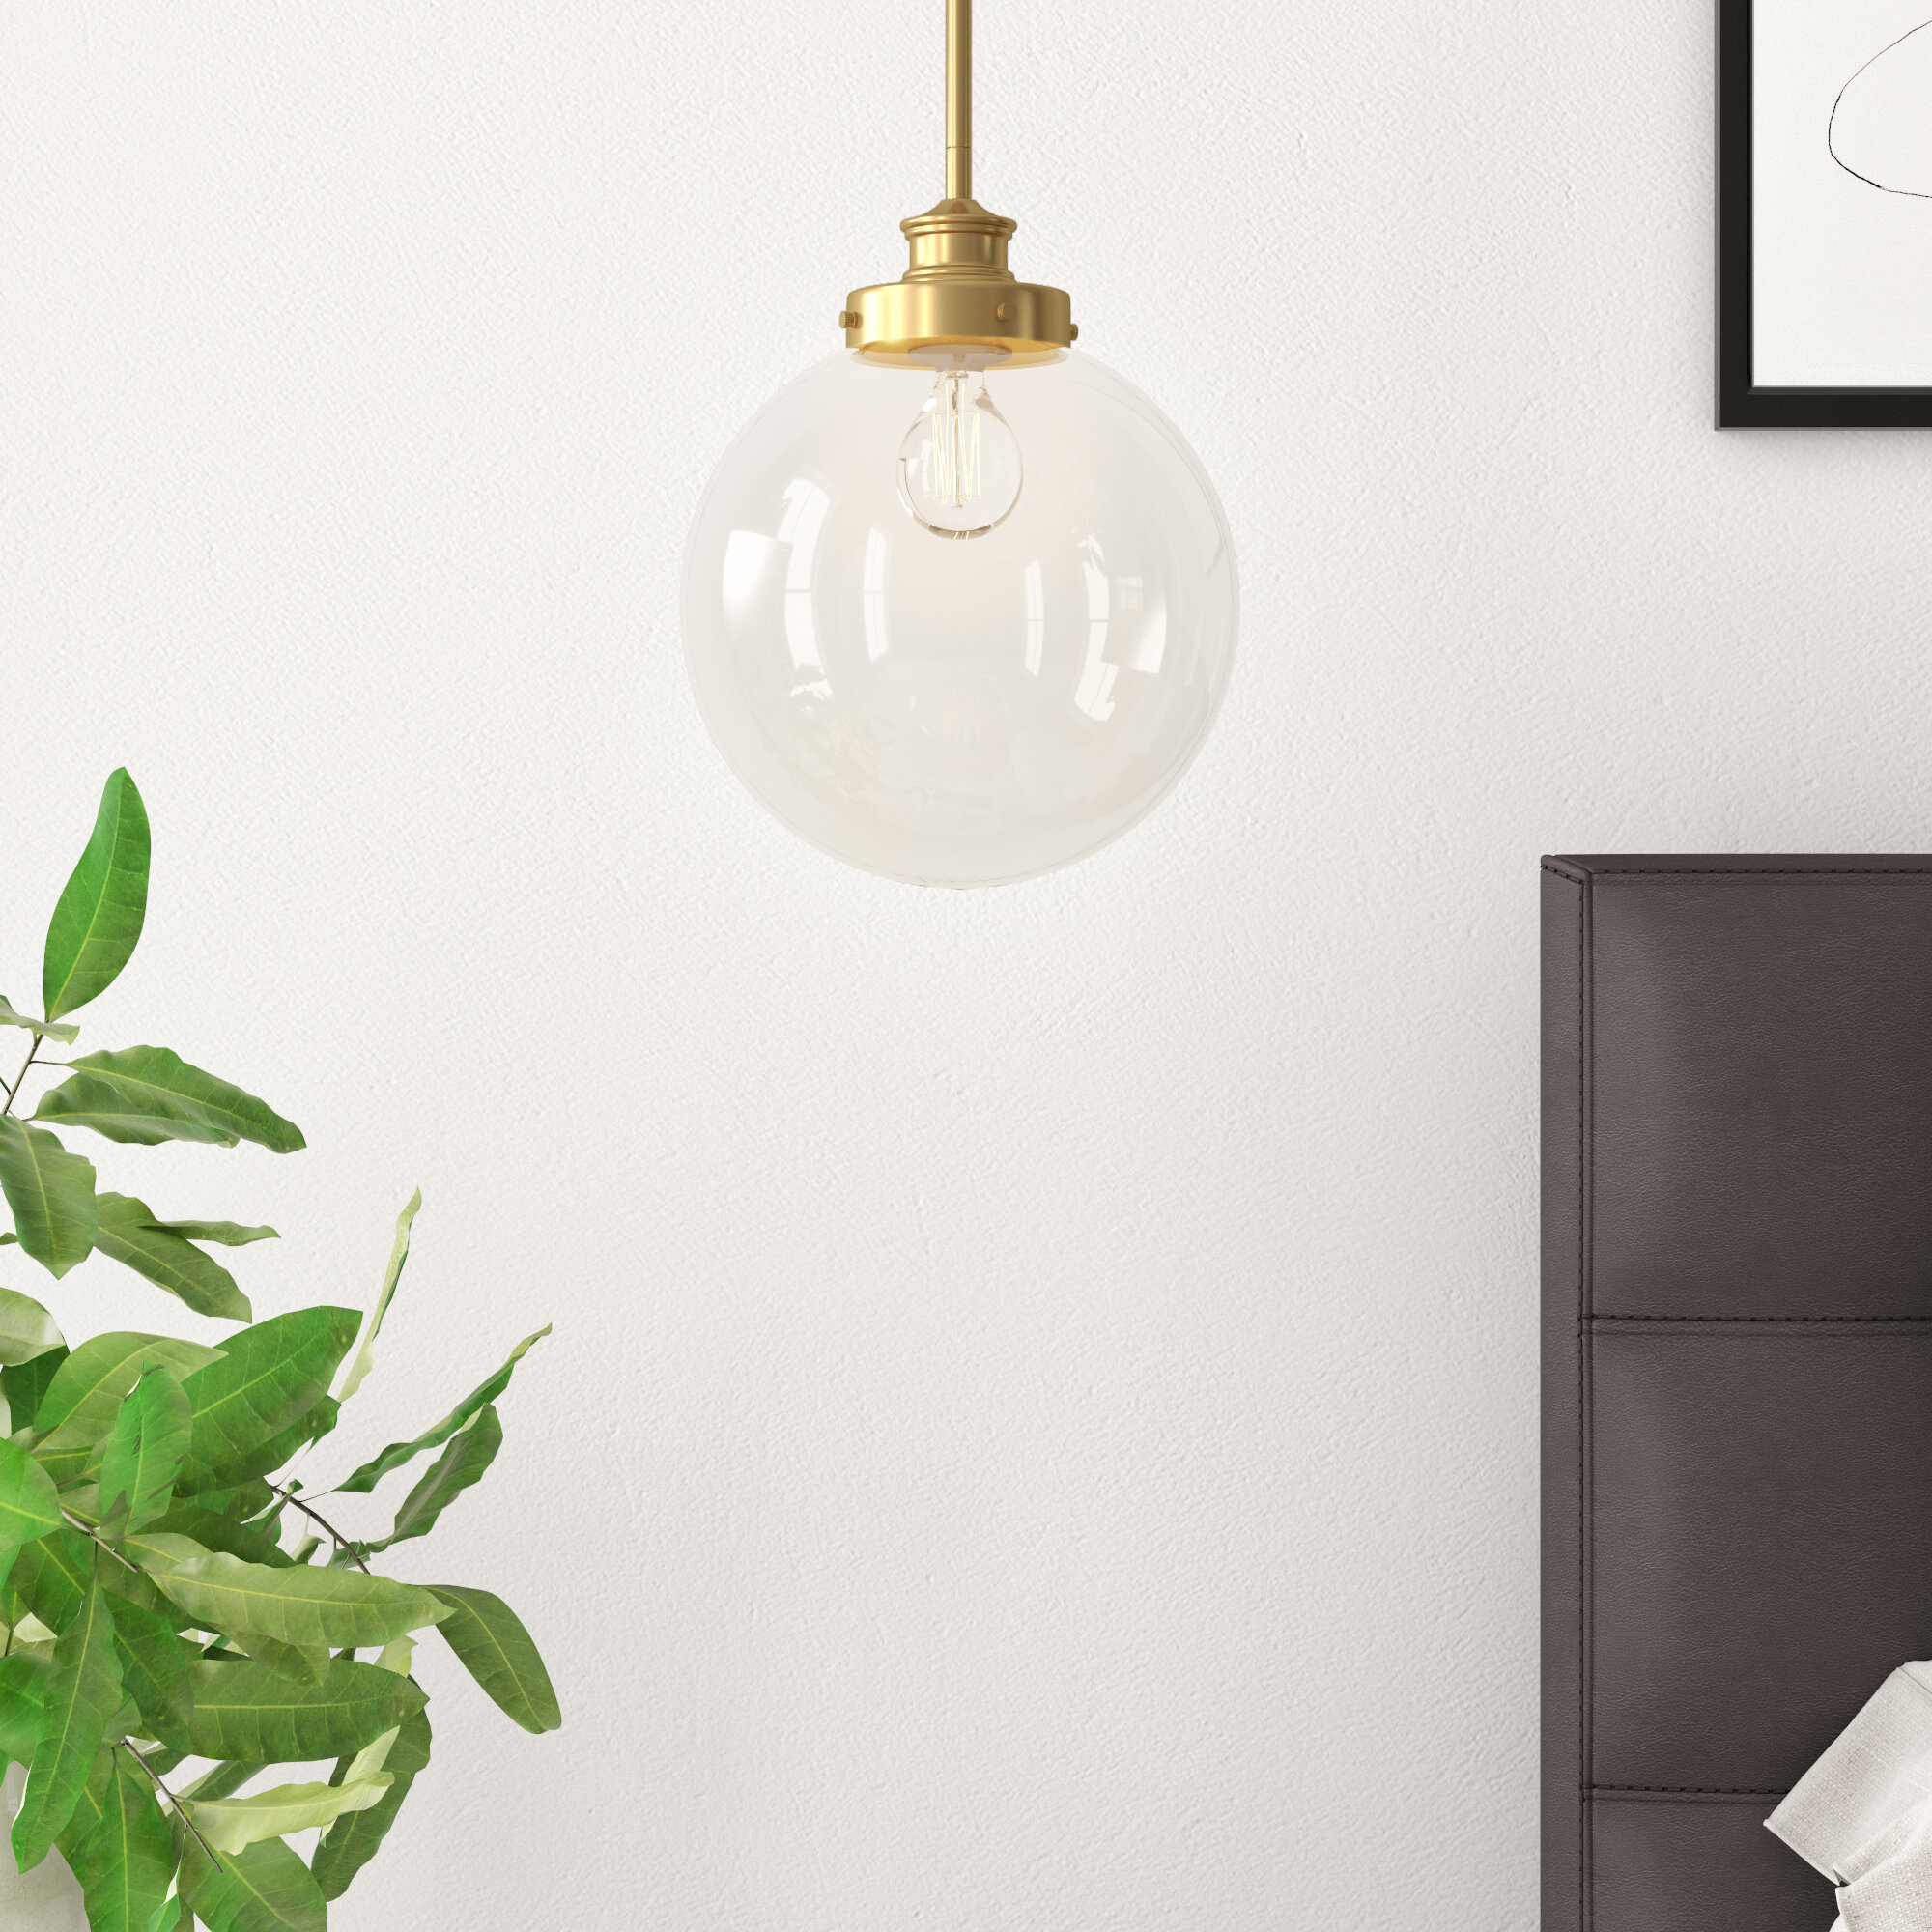 Cayden 1-Light Single Globe Pendant regarding Bautista 1-Light Single Globe Pendants (Image 18 of 30)